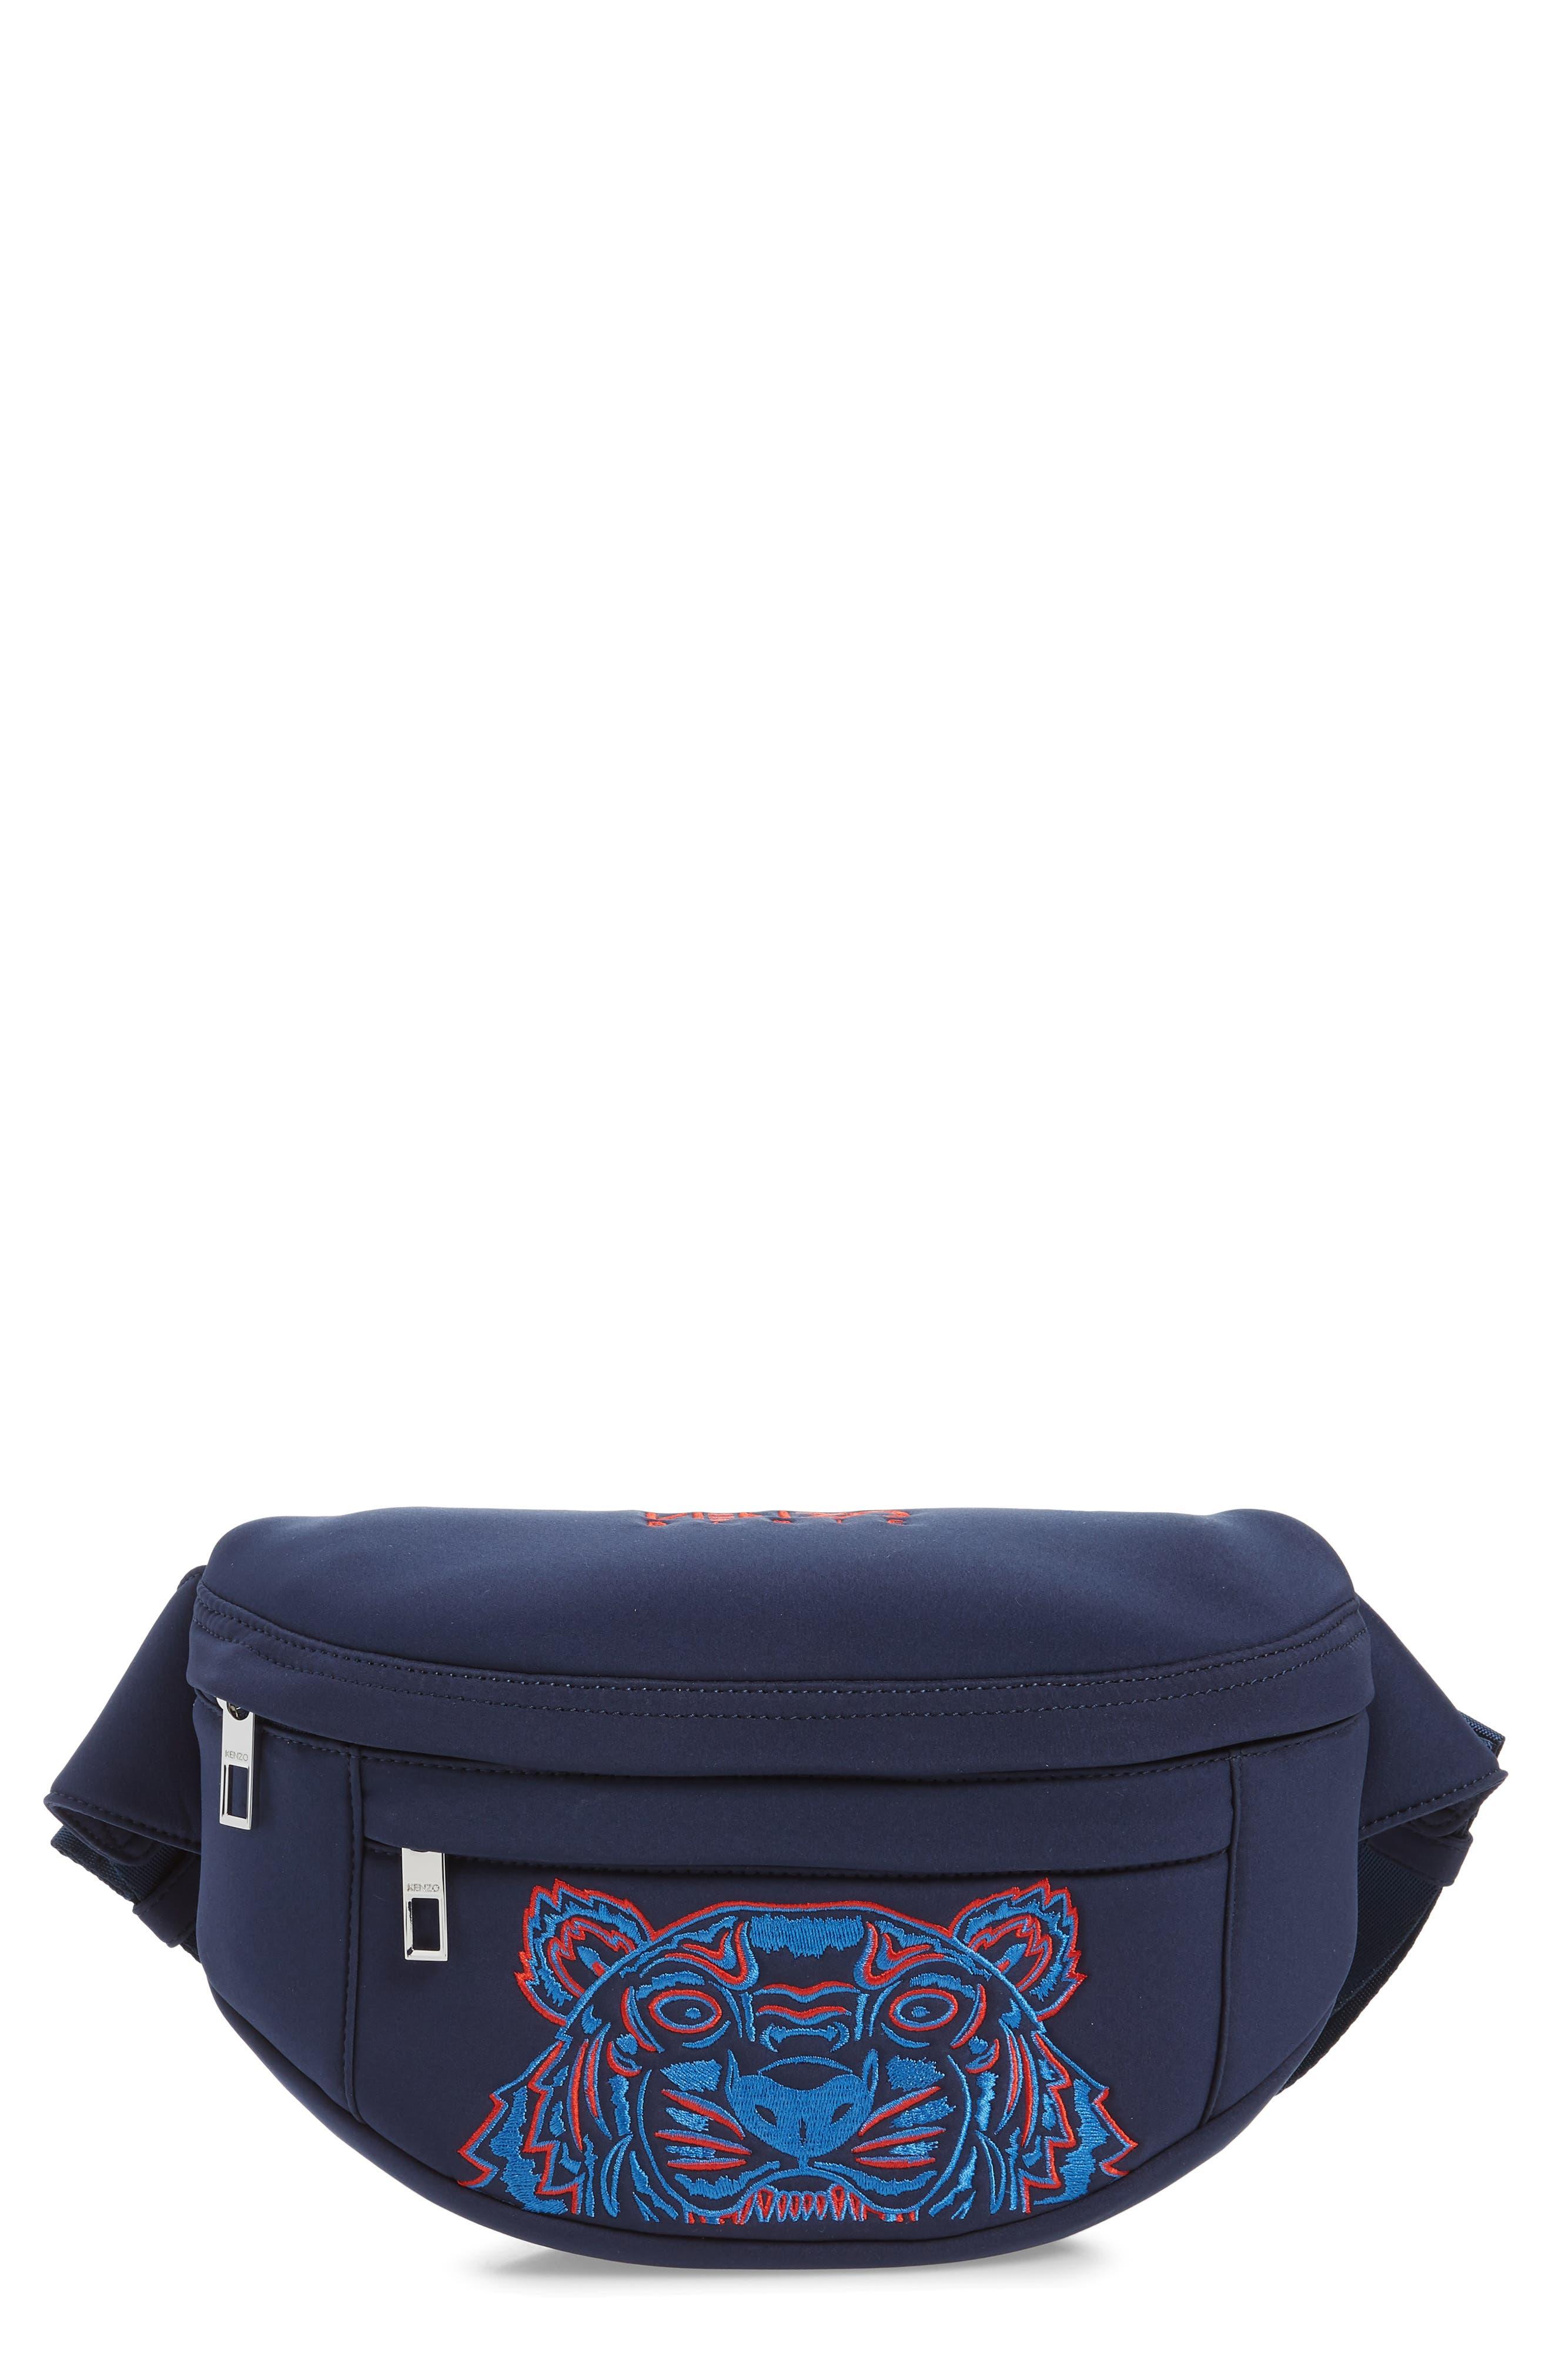 KENZO Embroidered Tiger Belt Bag, Main, color, 76A NAVY BLUE